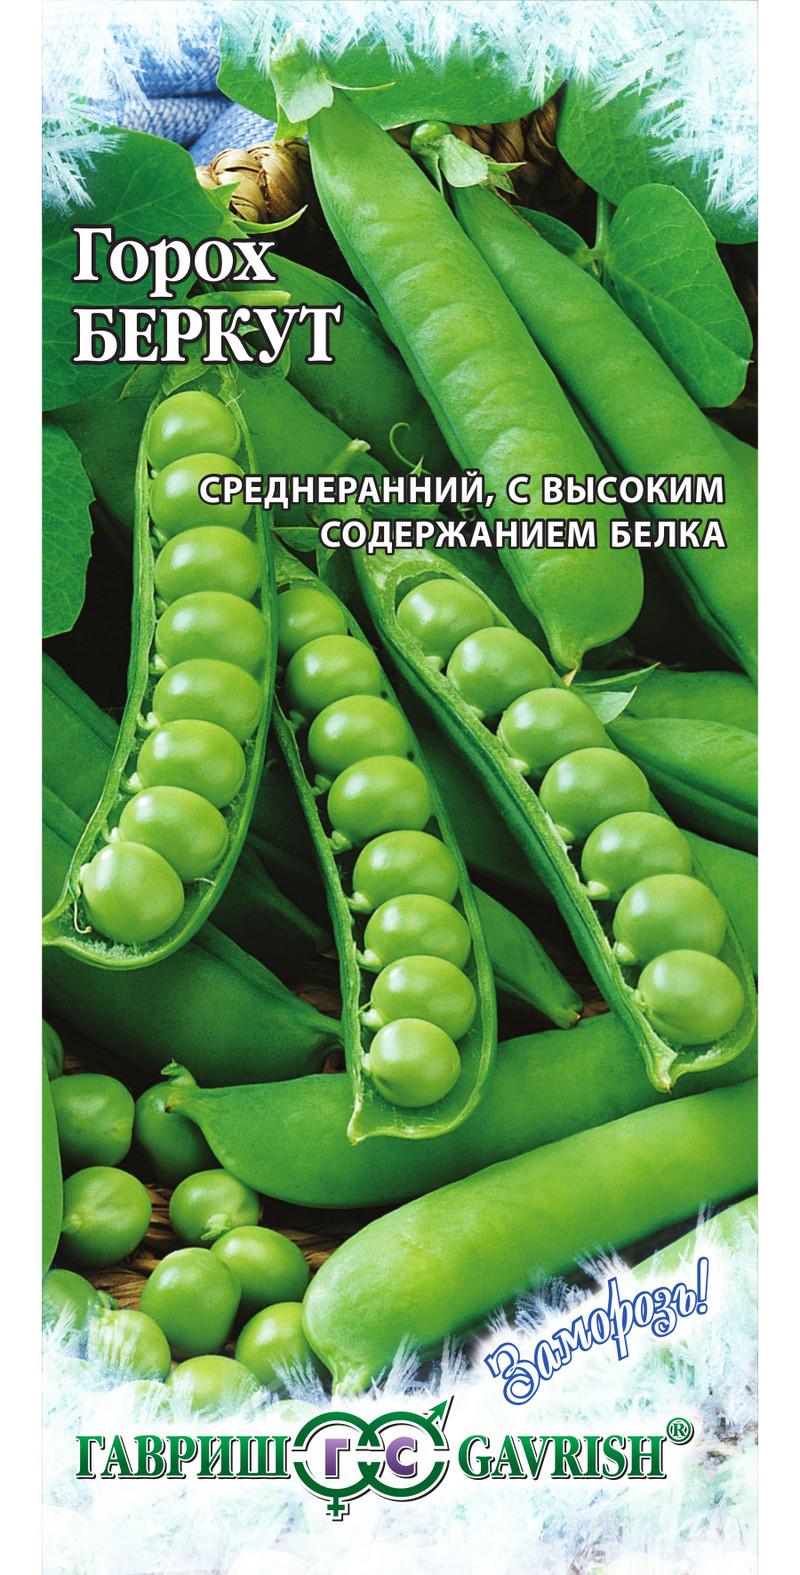 Семена Горох Беркут, 10 г, Гавриш